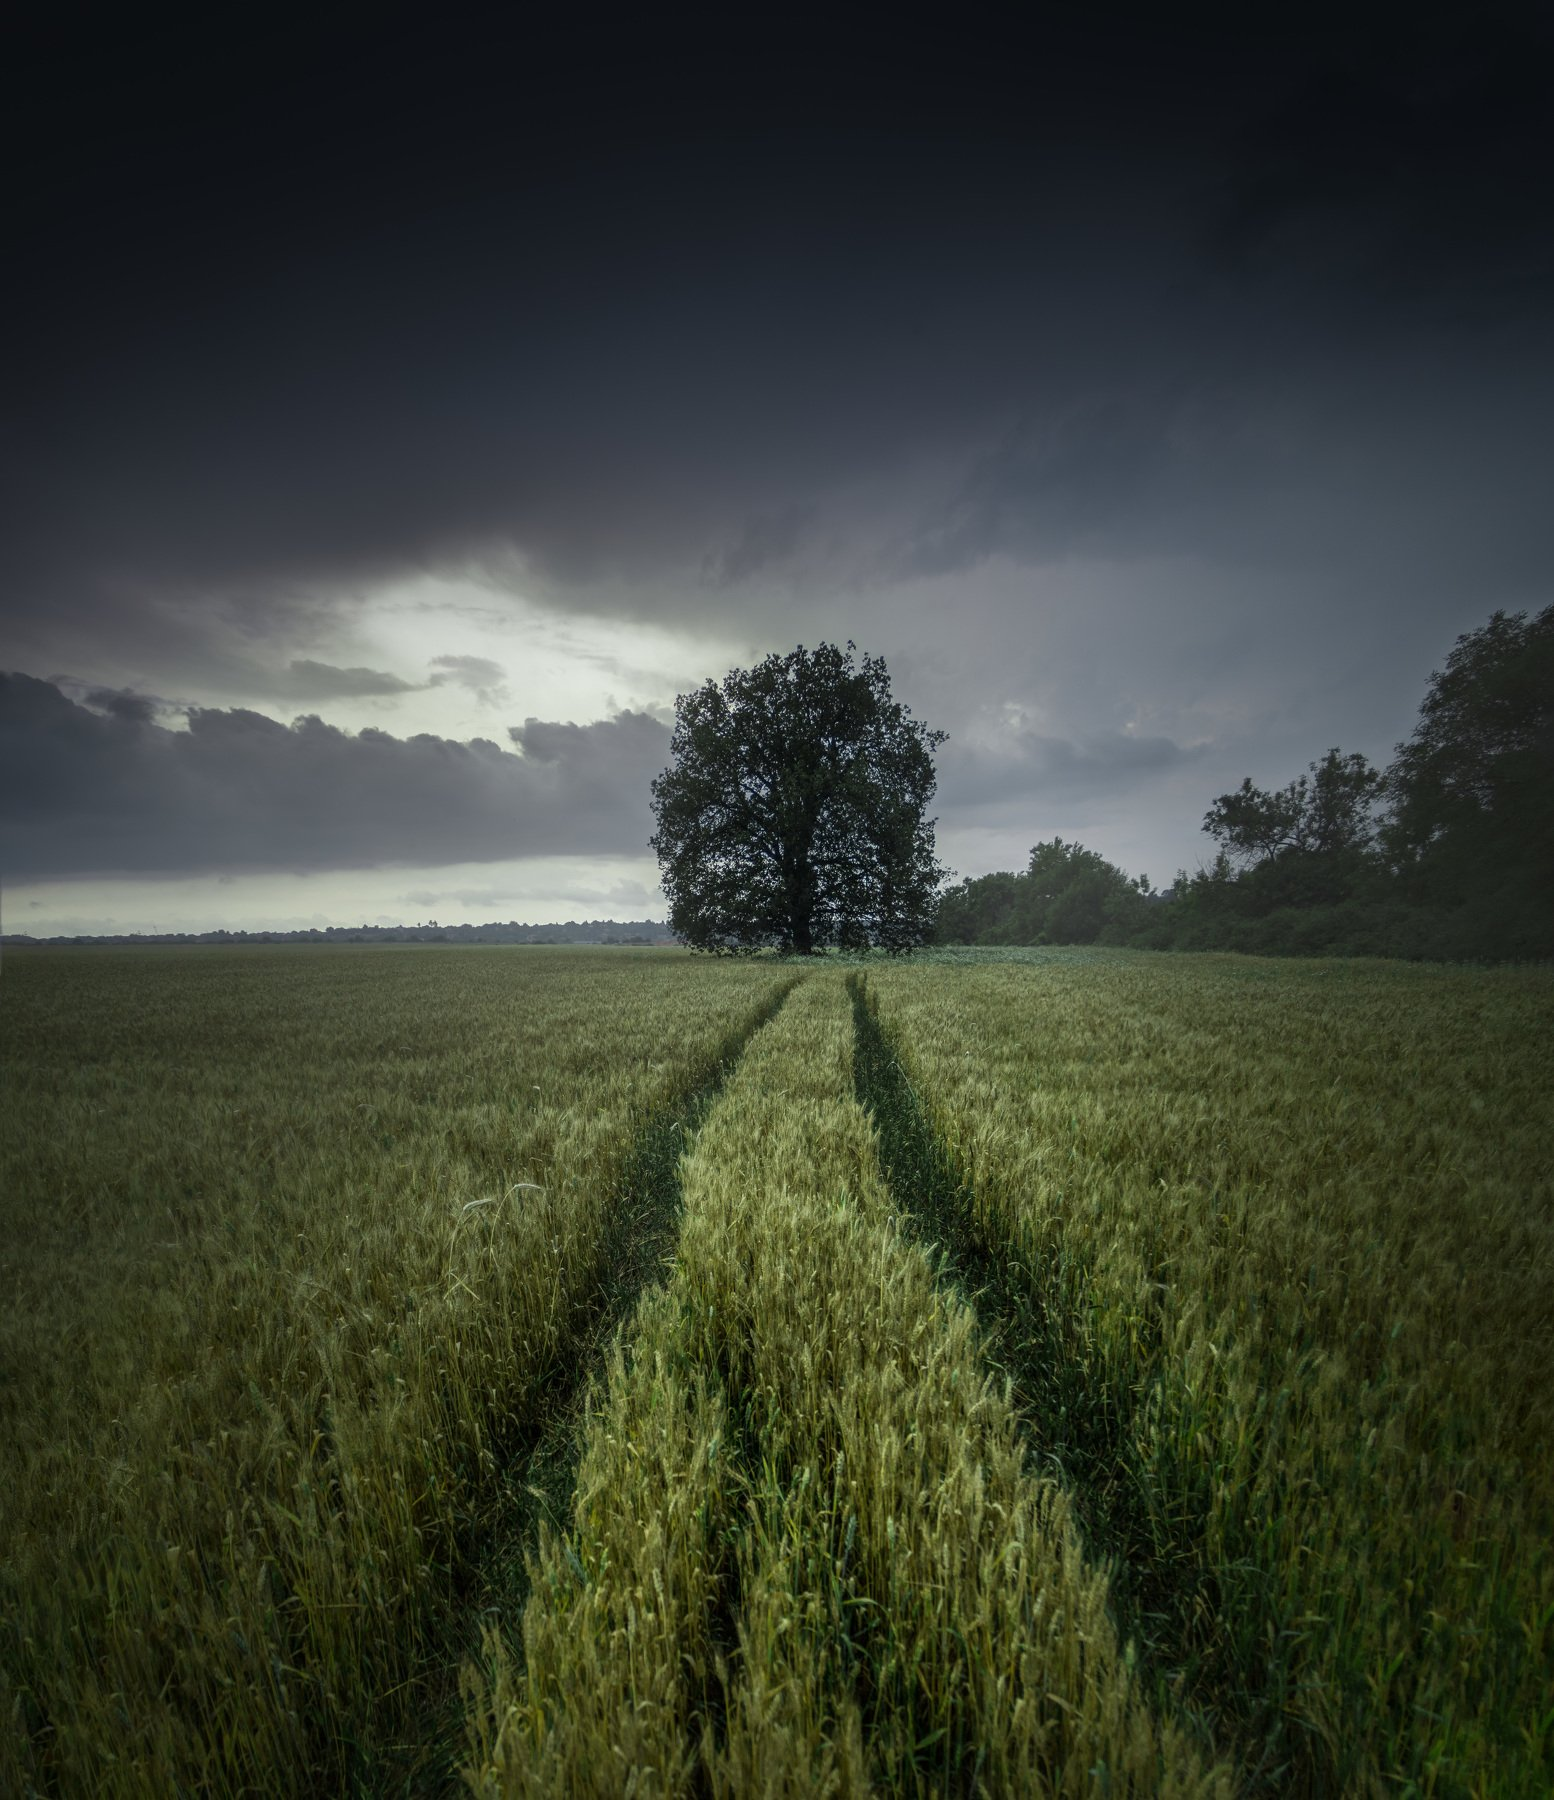 landscape, field, wheat, storm, rain, clouds, sky, grain, barley, bulgaria, tree, moody, dramatic, panorama, nature, spring, green, summer, sunlight, rays, homeland, plain,, Кристиян Младенов